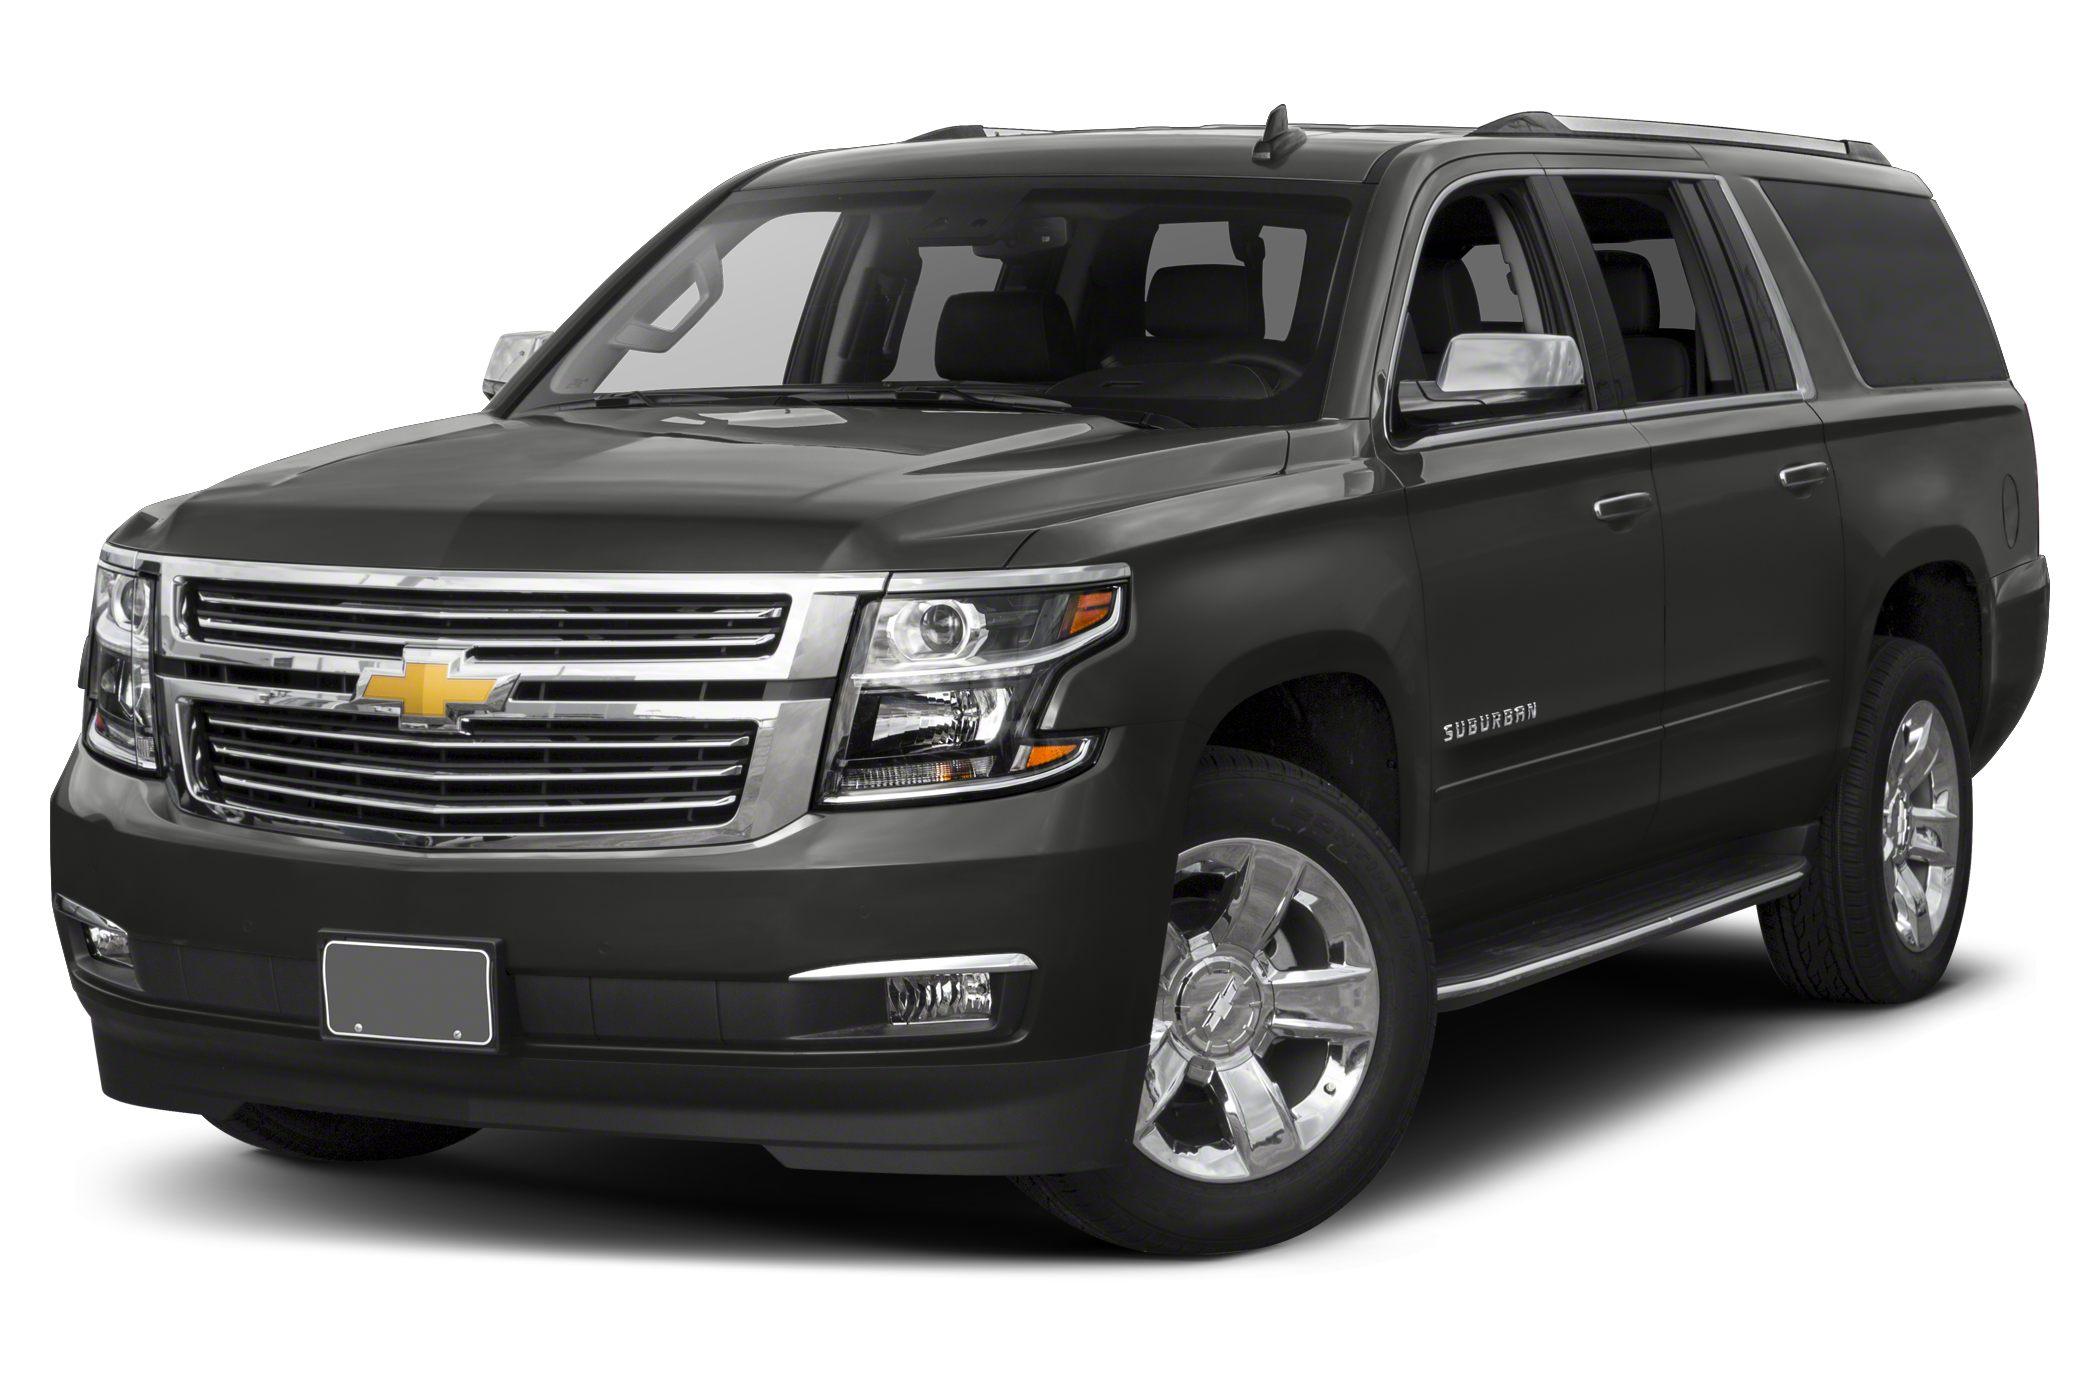 Chevrolet Suburban Sport Utility Models Price Specs